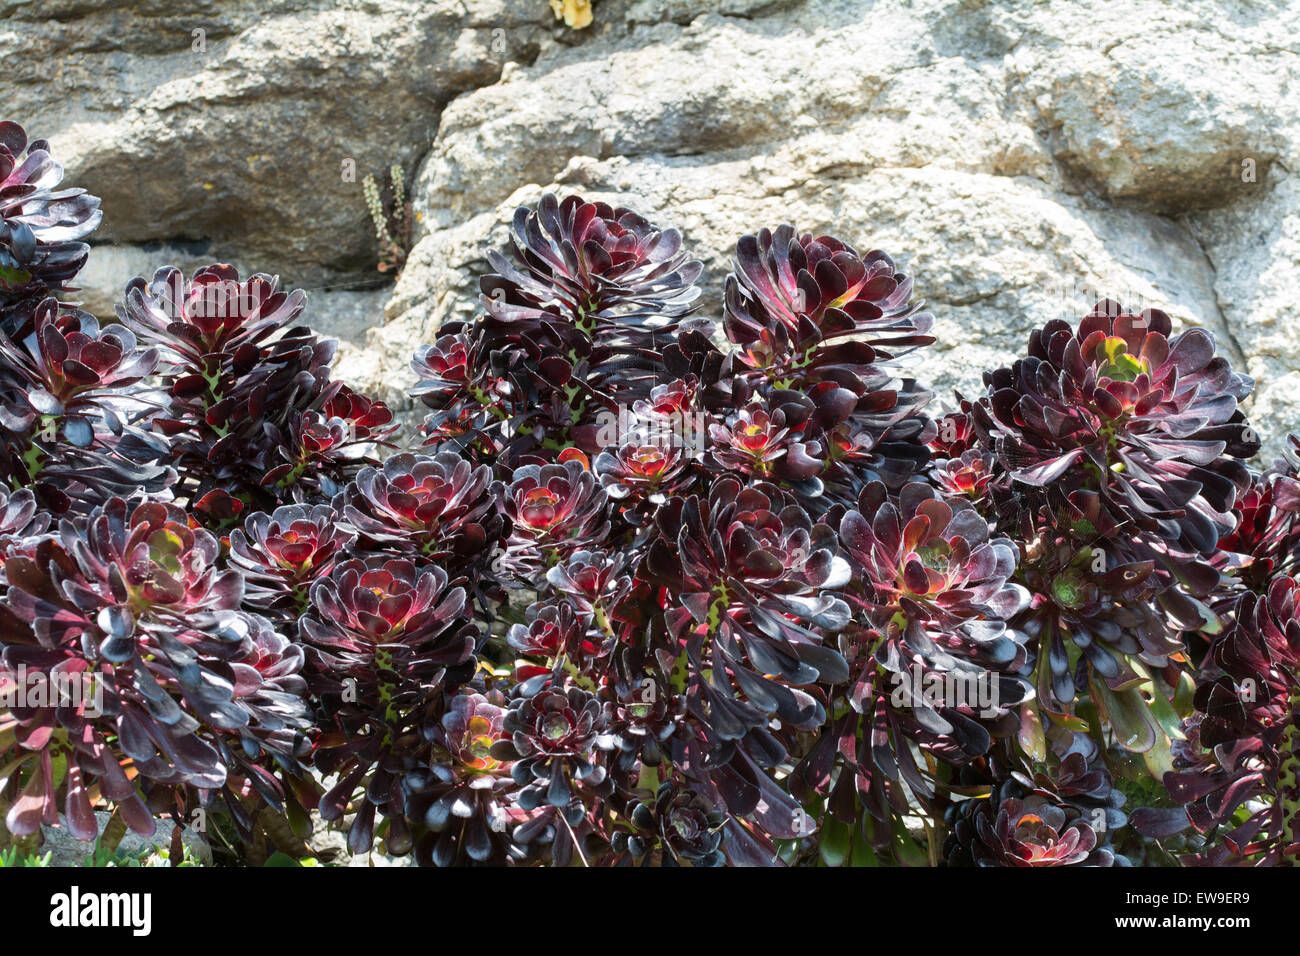 Dark purple aeoniums against a white rock - Stock Image